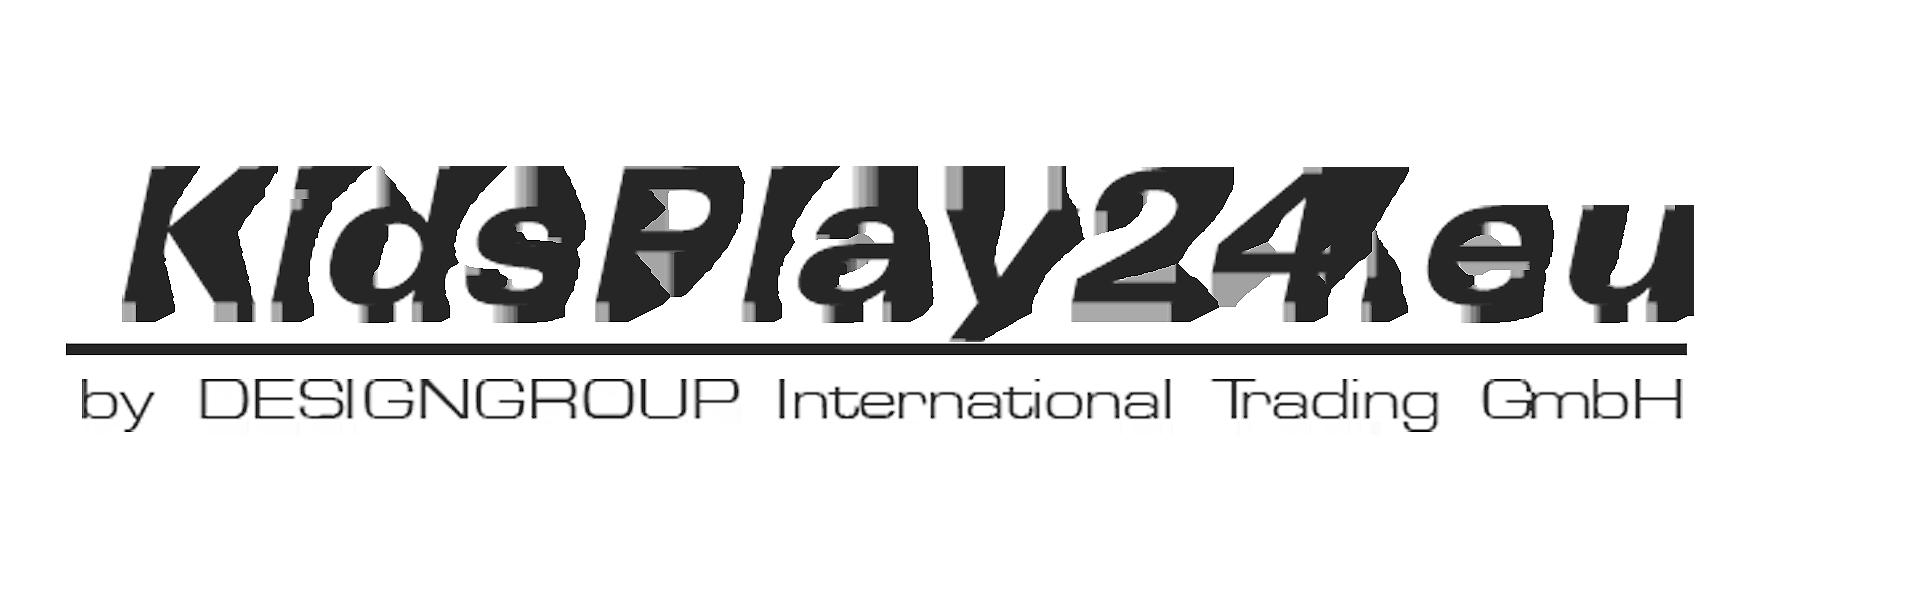 KidsPlay24